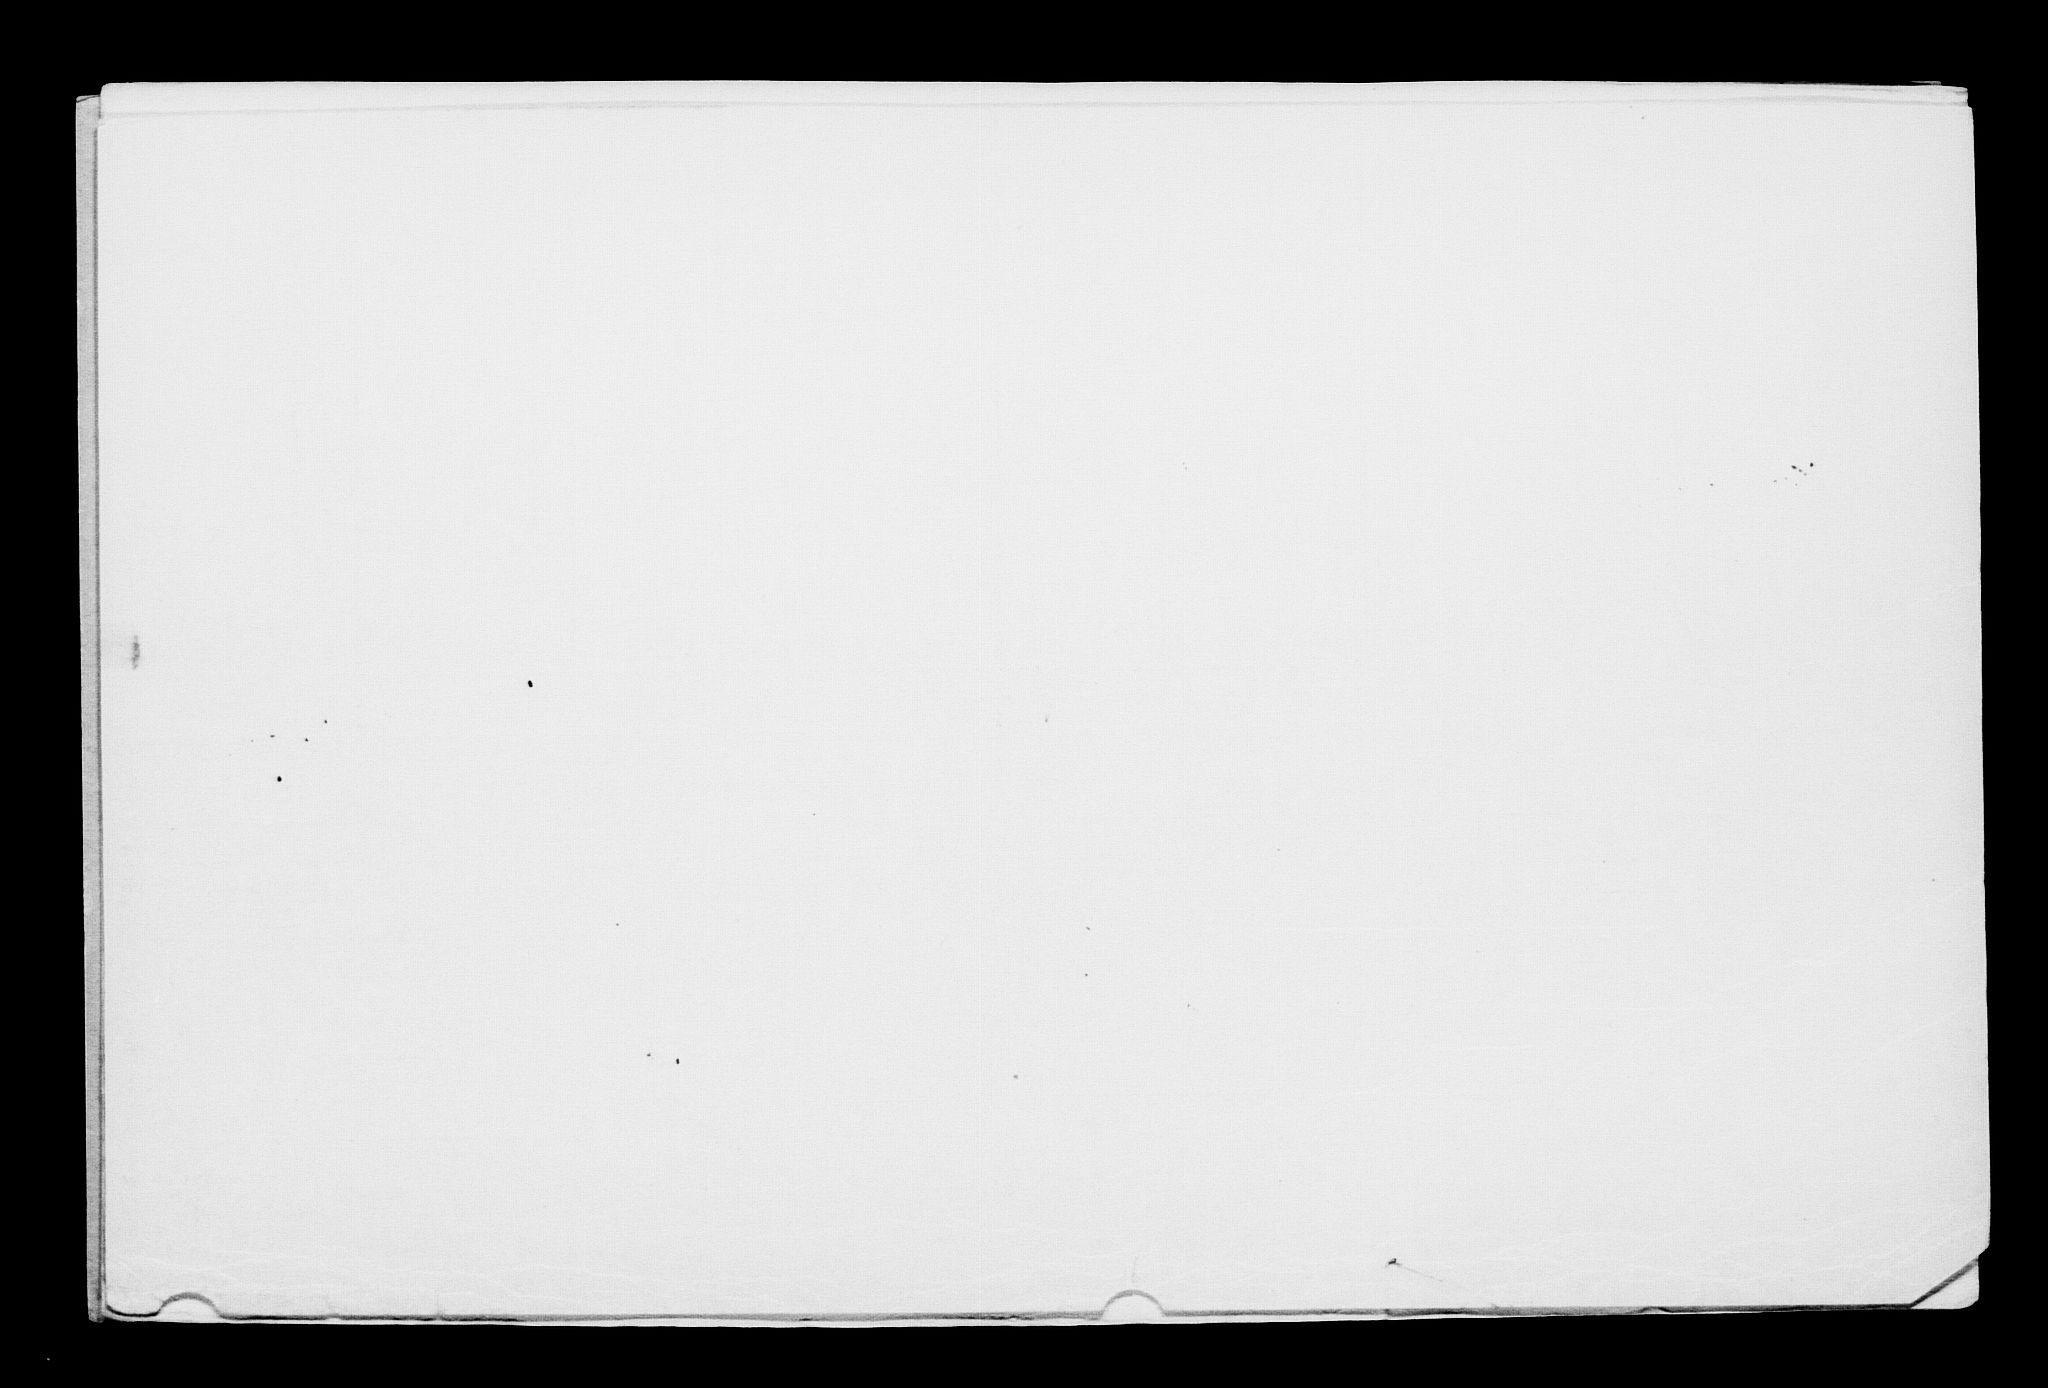 RA, Direktoratet for sjømenn, G/Gb/L0010: Hovedkort, 1891-1892, s. 319